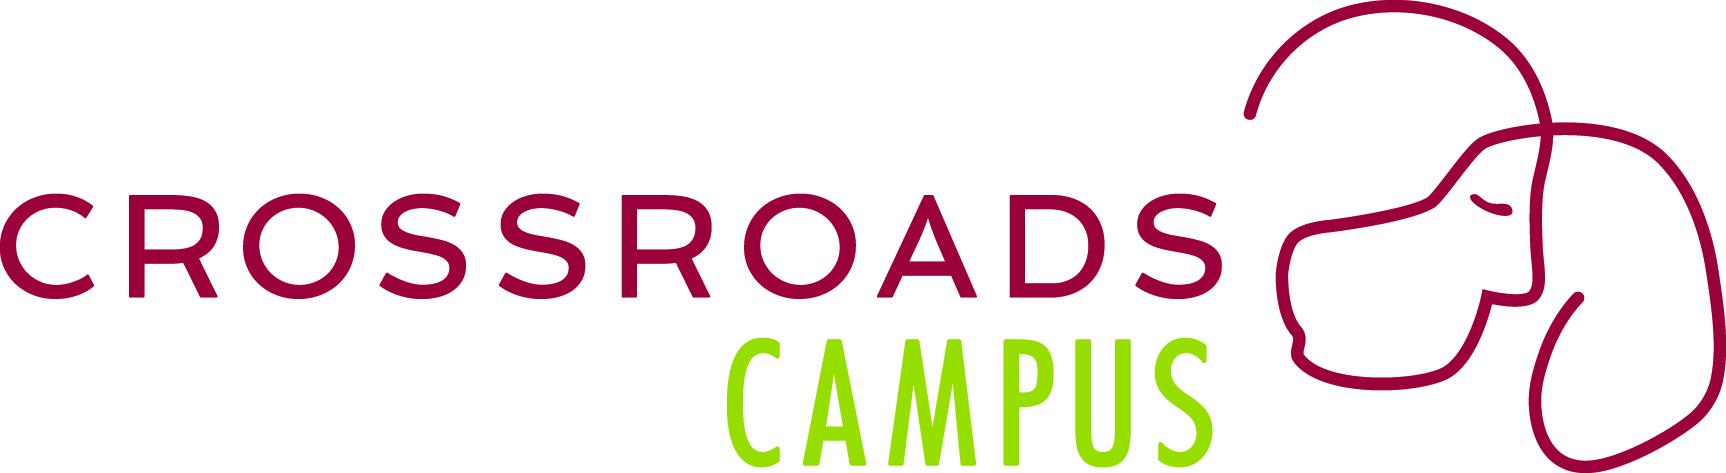 Crossroads Campus_Logo.jpg